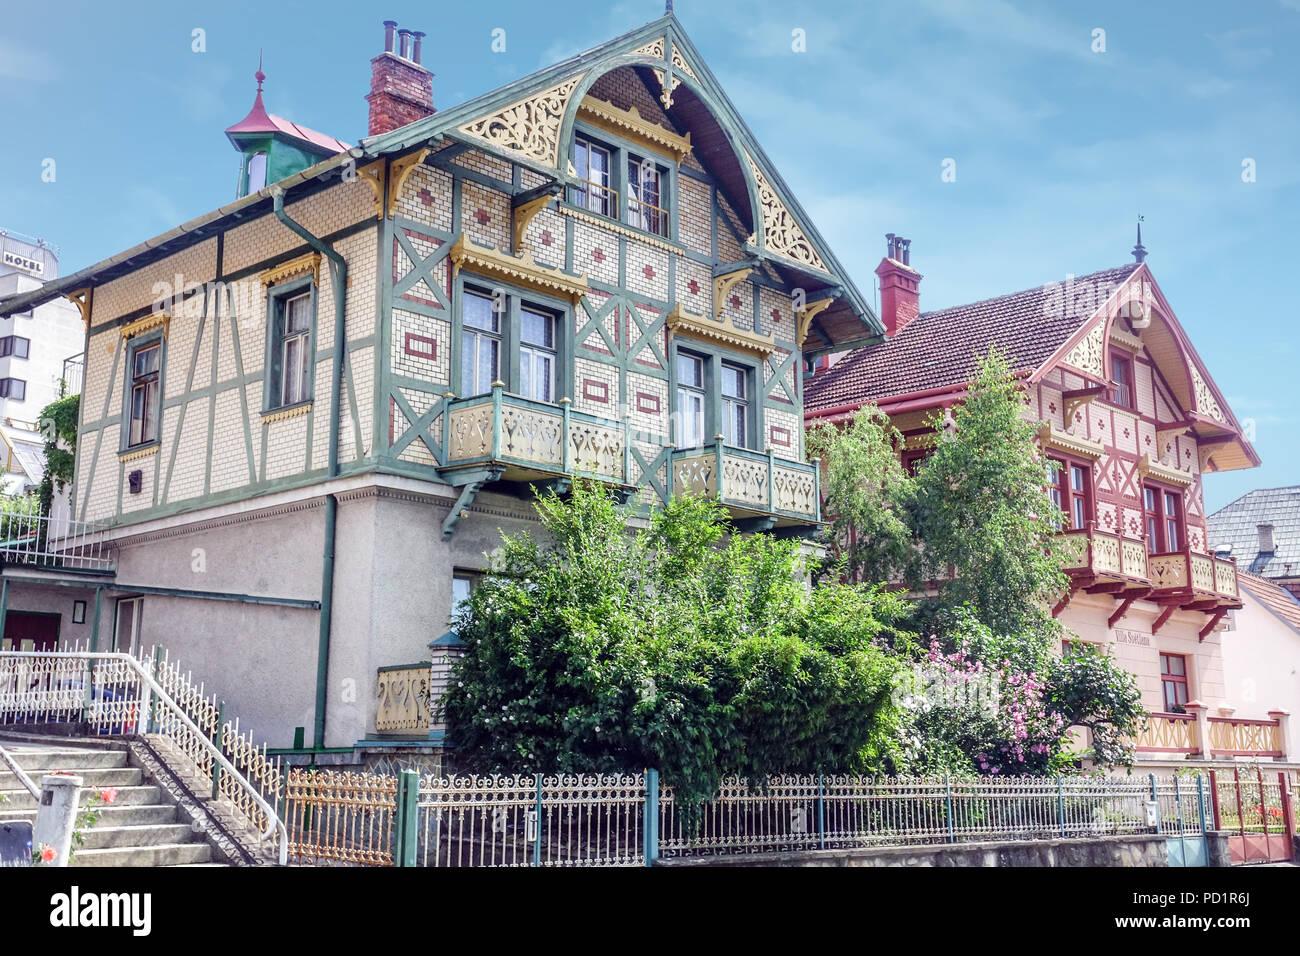 Luhacovice is a spa town in the Zlin Region, Moravia, Czech Republic. - Stock Image